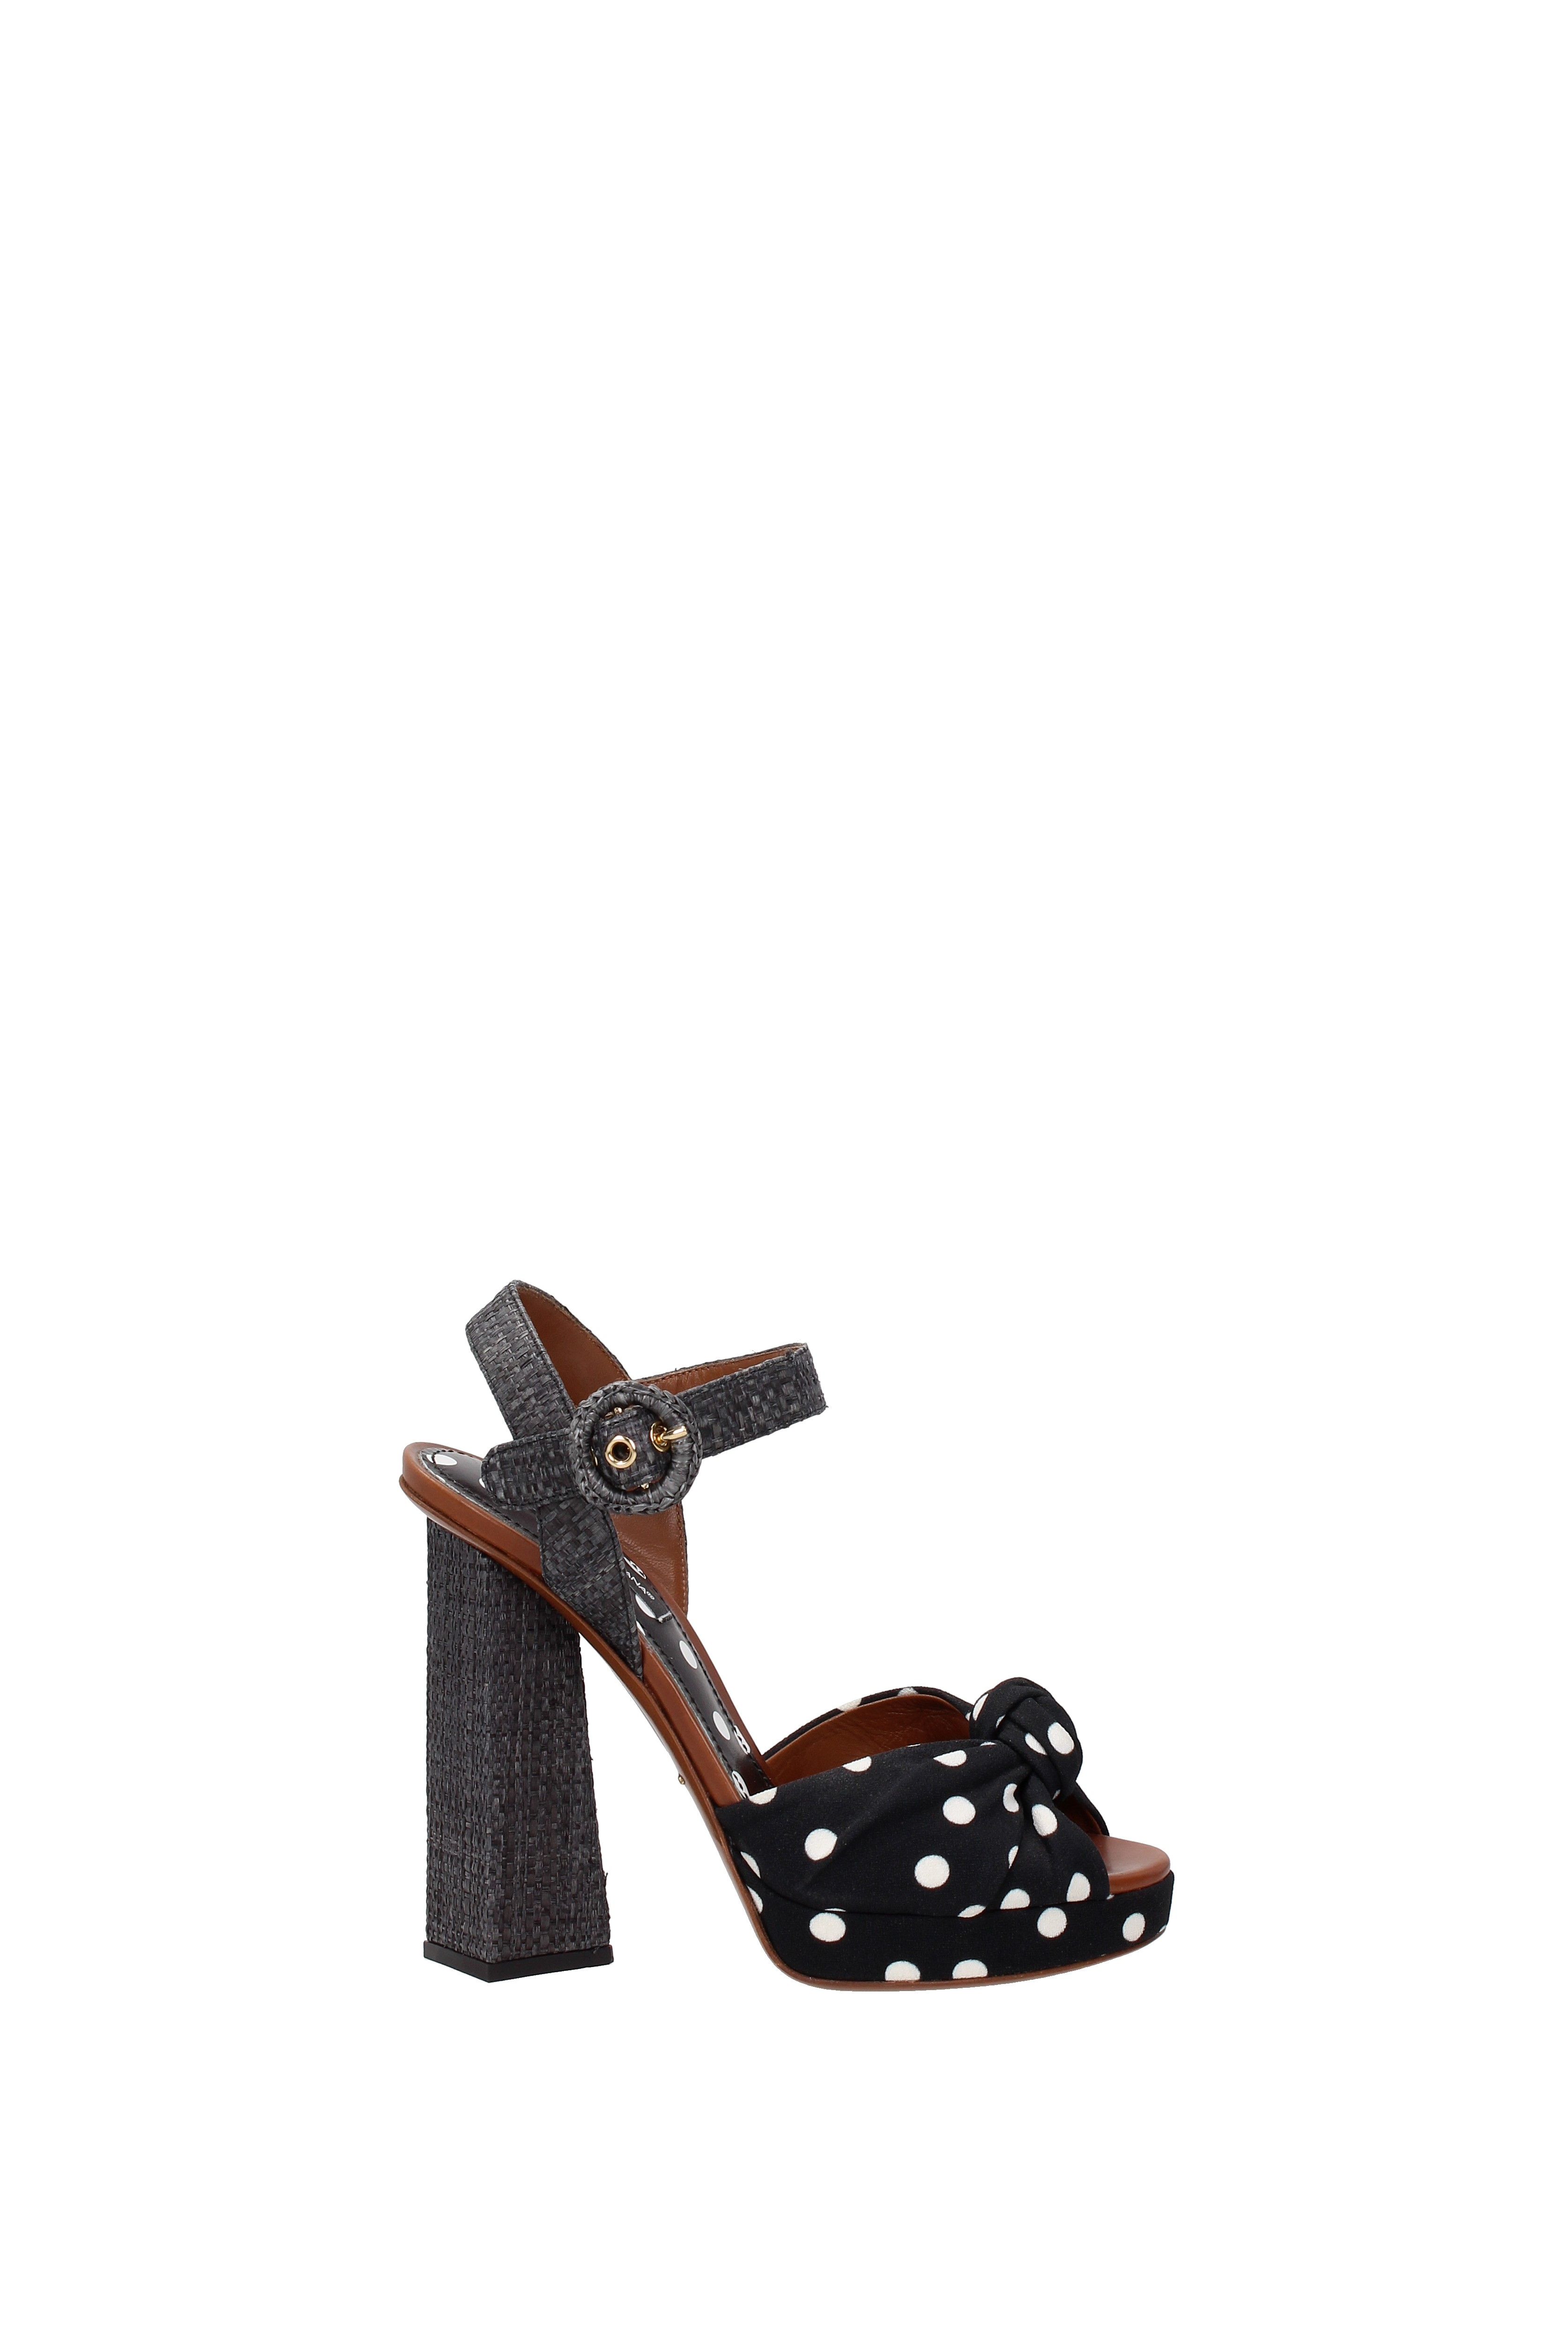 Sandalen Dolce&Gabbana Damen - (CR0241AG369) Stoff (CR0241AG369) - e5a5a4